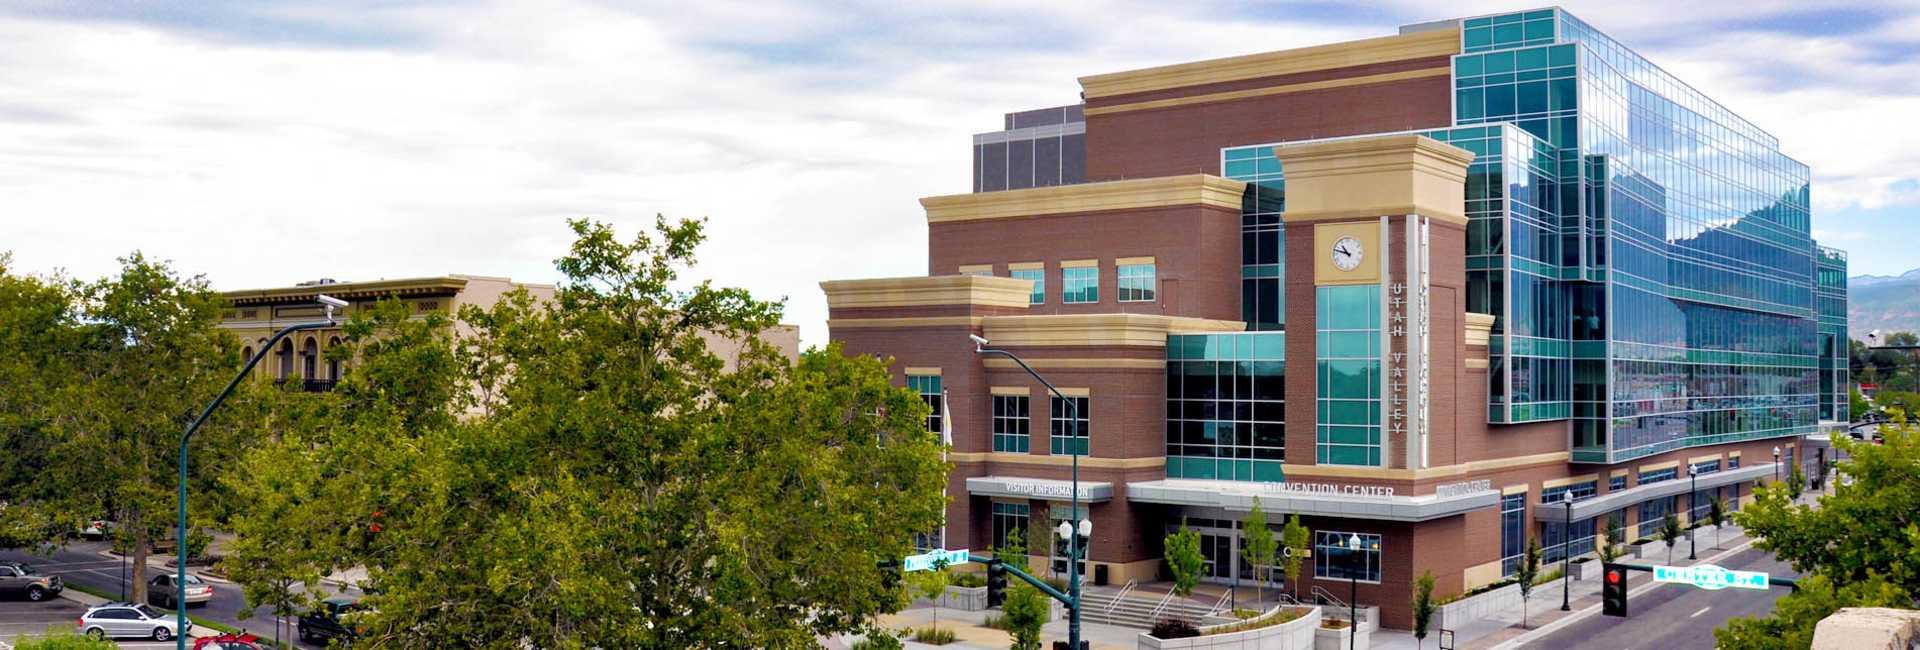 Utah Valley Convention Center exterior